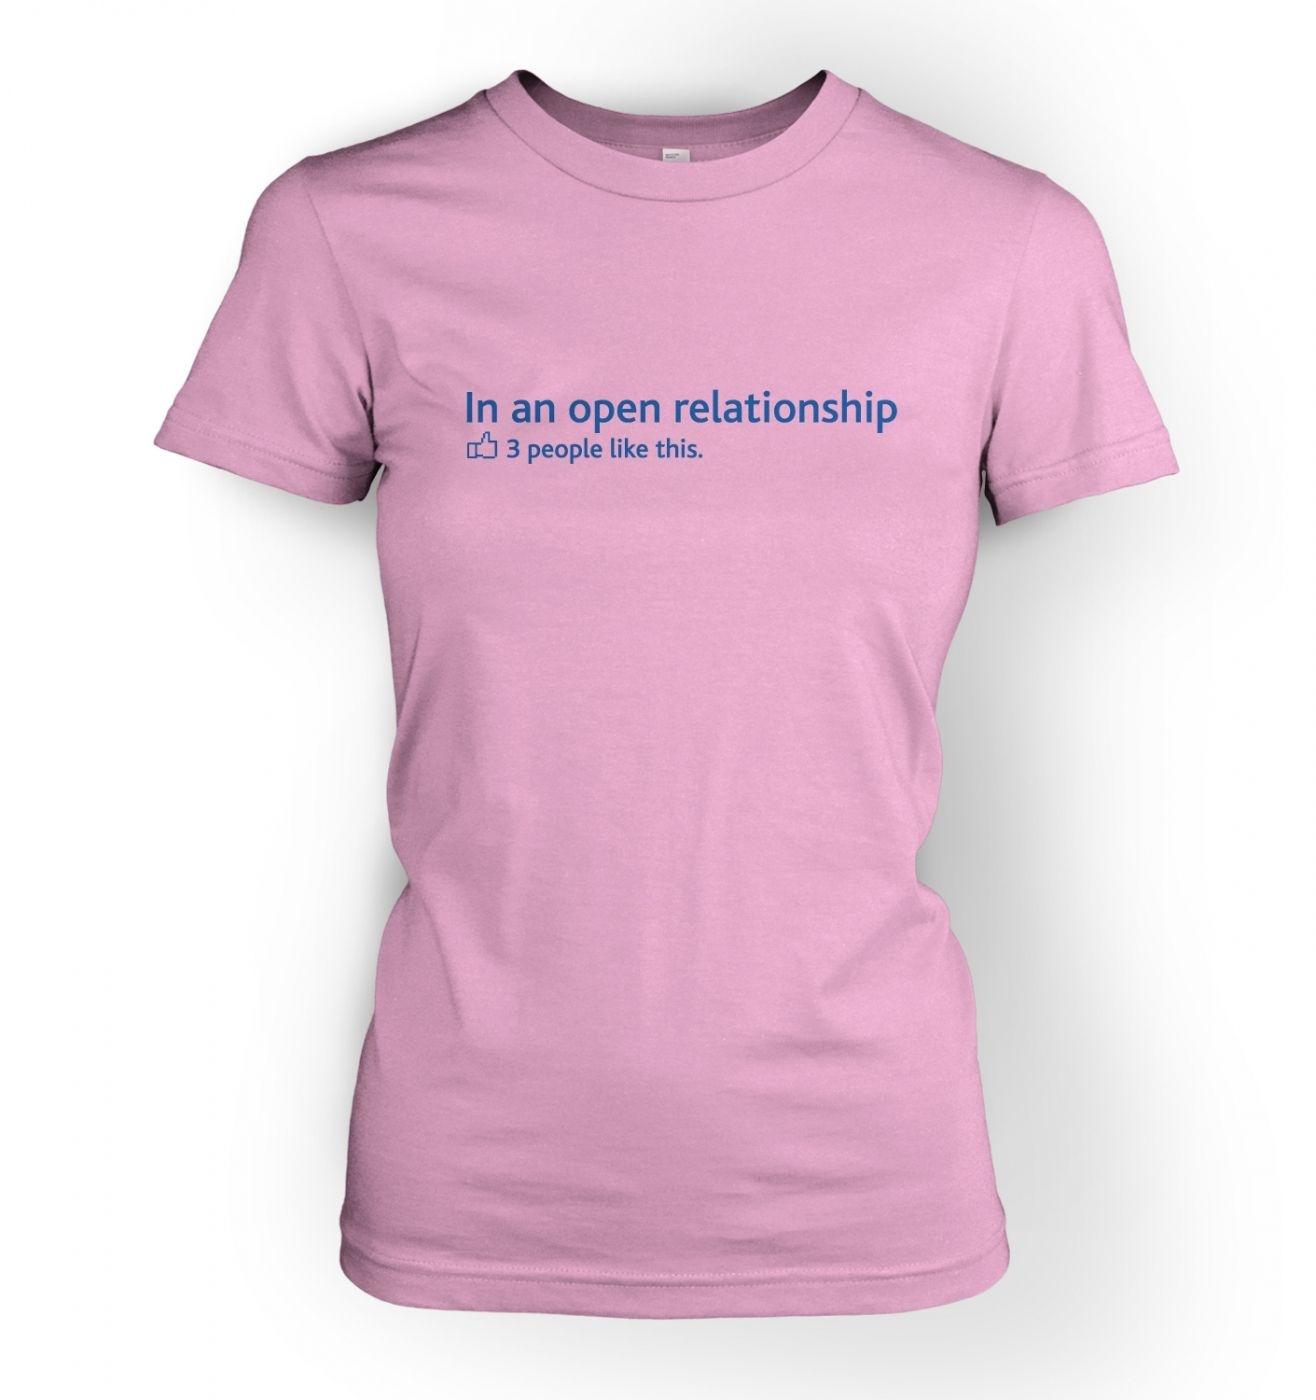 Women's In an open relationship social status t-shirt